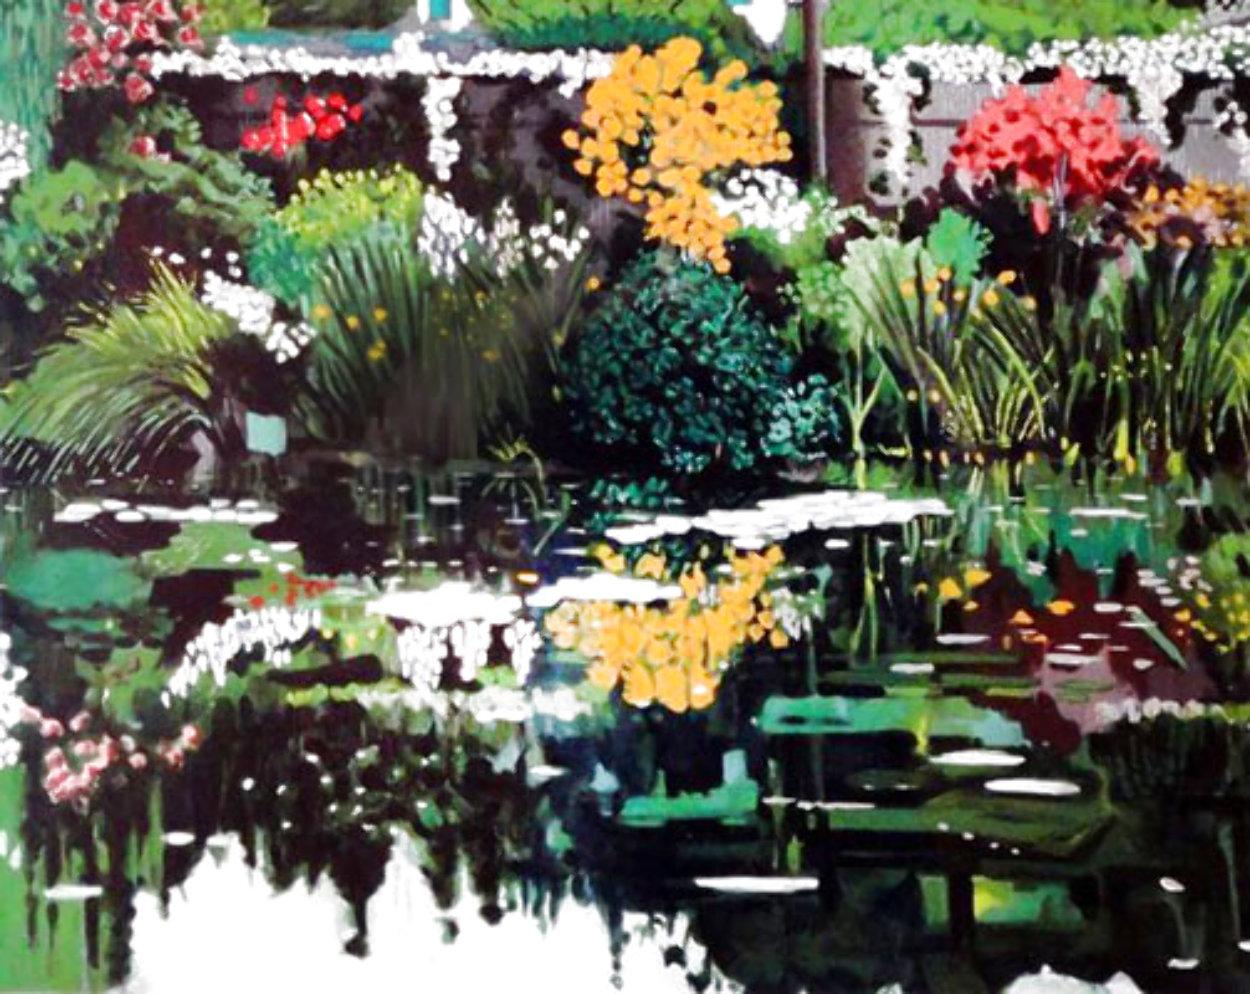 Golden Pavilion, Monet's Garden 1990 Limited Edition Print by Tony Bennett